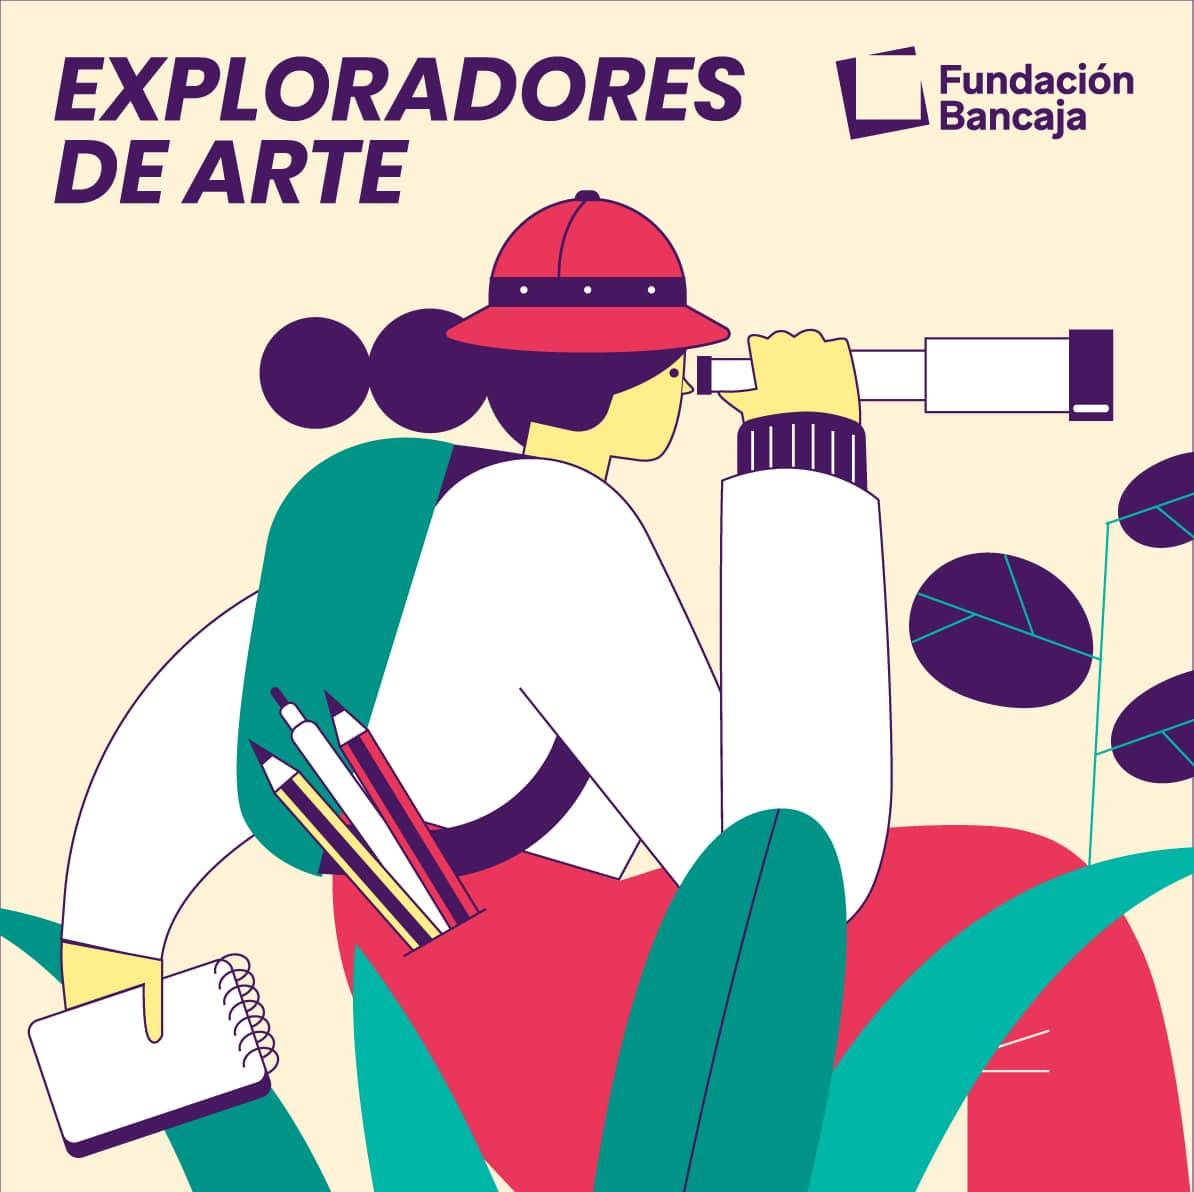 Exploradores-de-arte